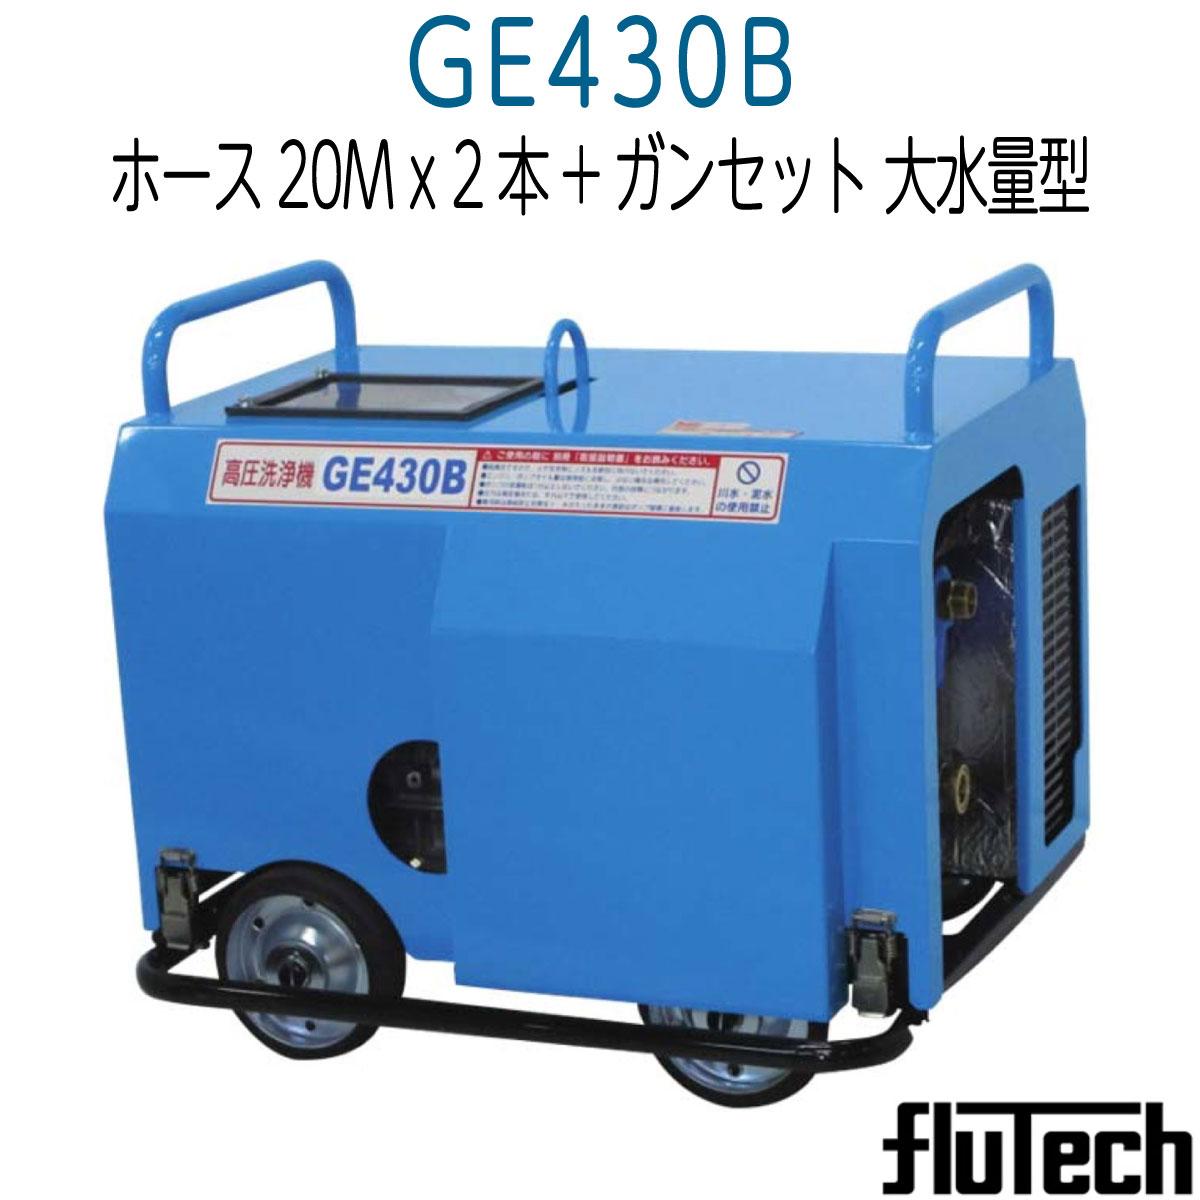 GE430K フルテック簡易防音型